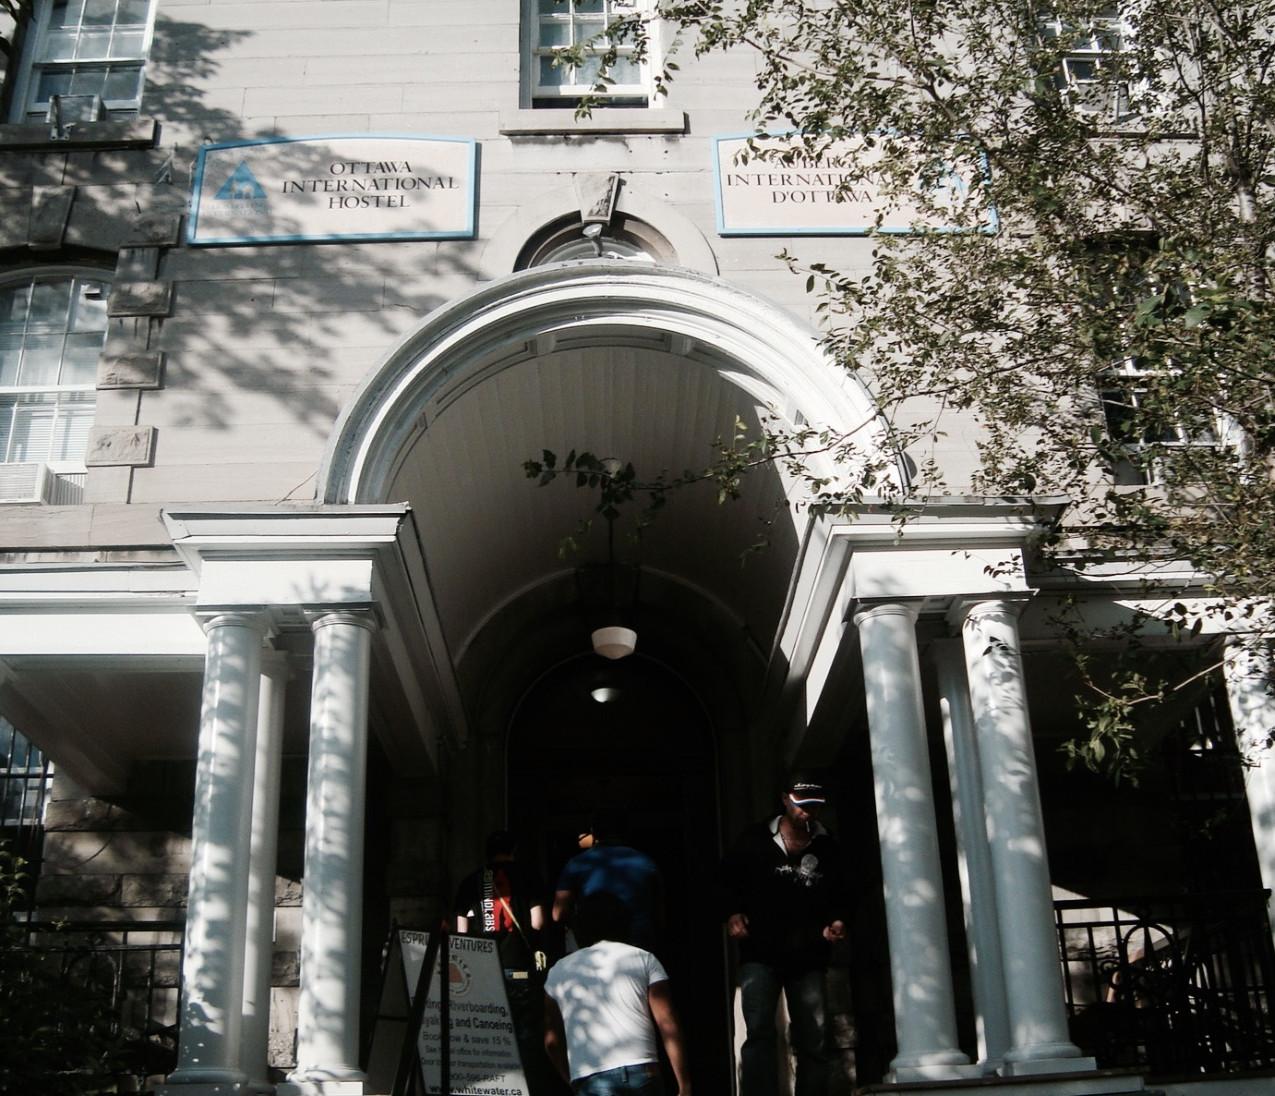 Entrada HI Hostel Ottawa - De Viaje con Armando